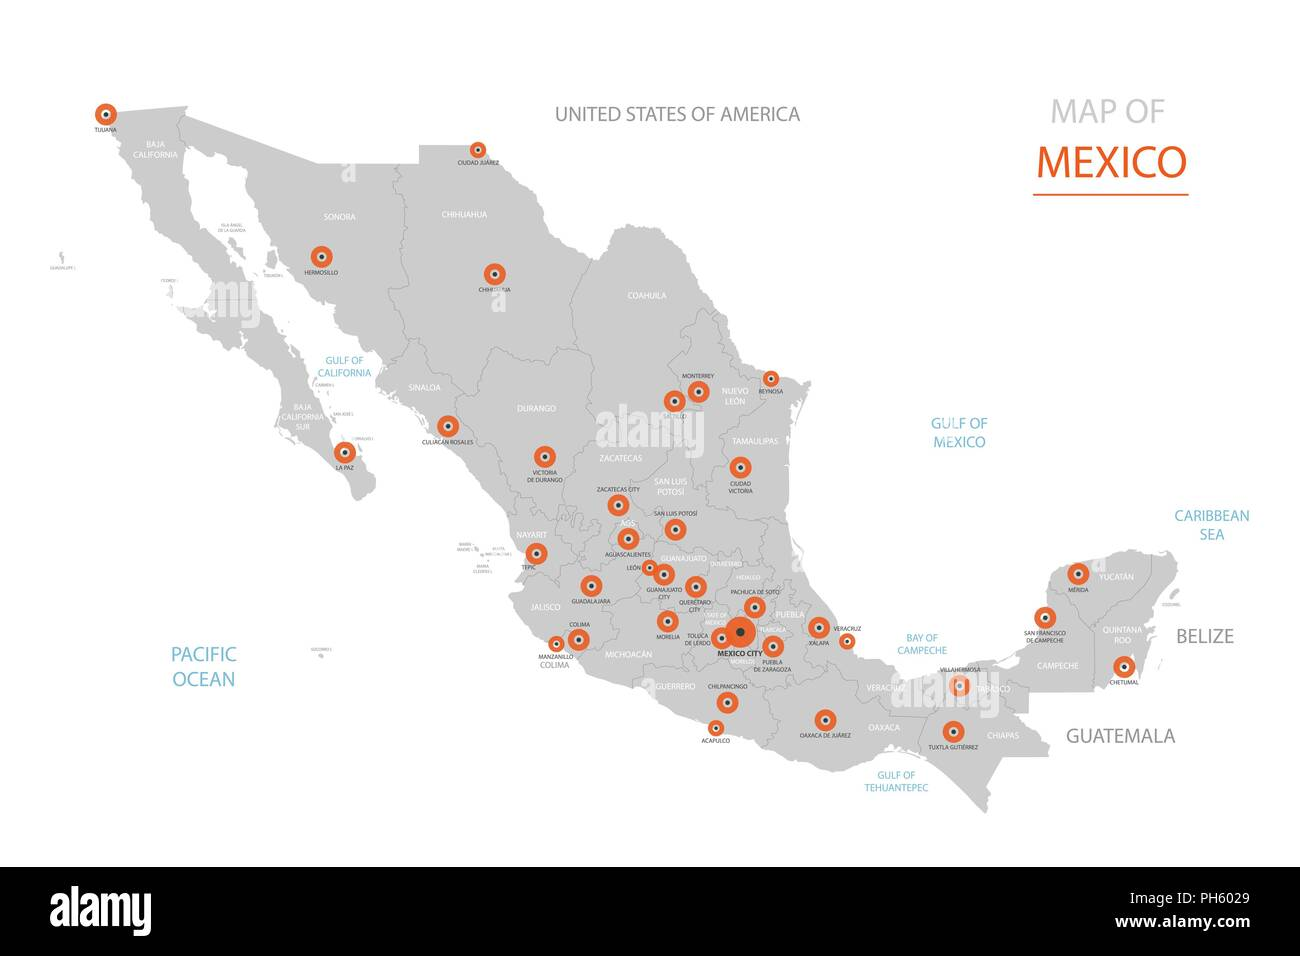 Mexiko Karte Umriss.Stylized Vector Mexiko Karte Der Grossen Stadte Die